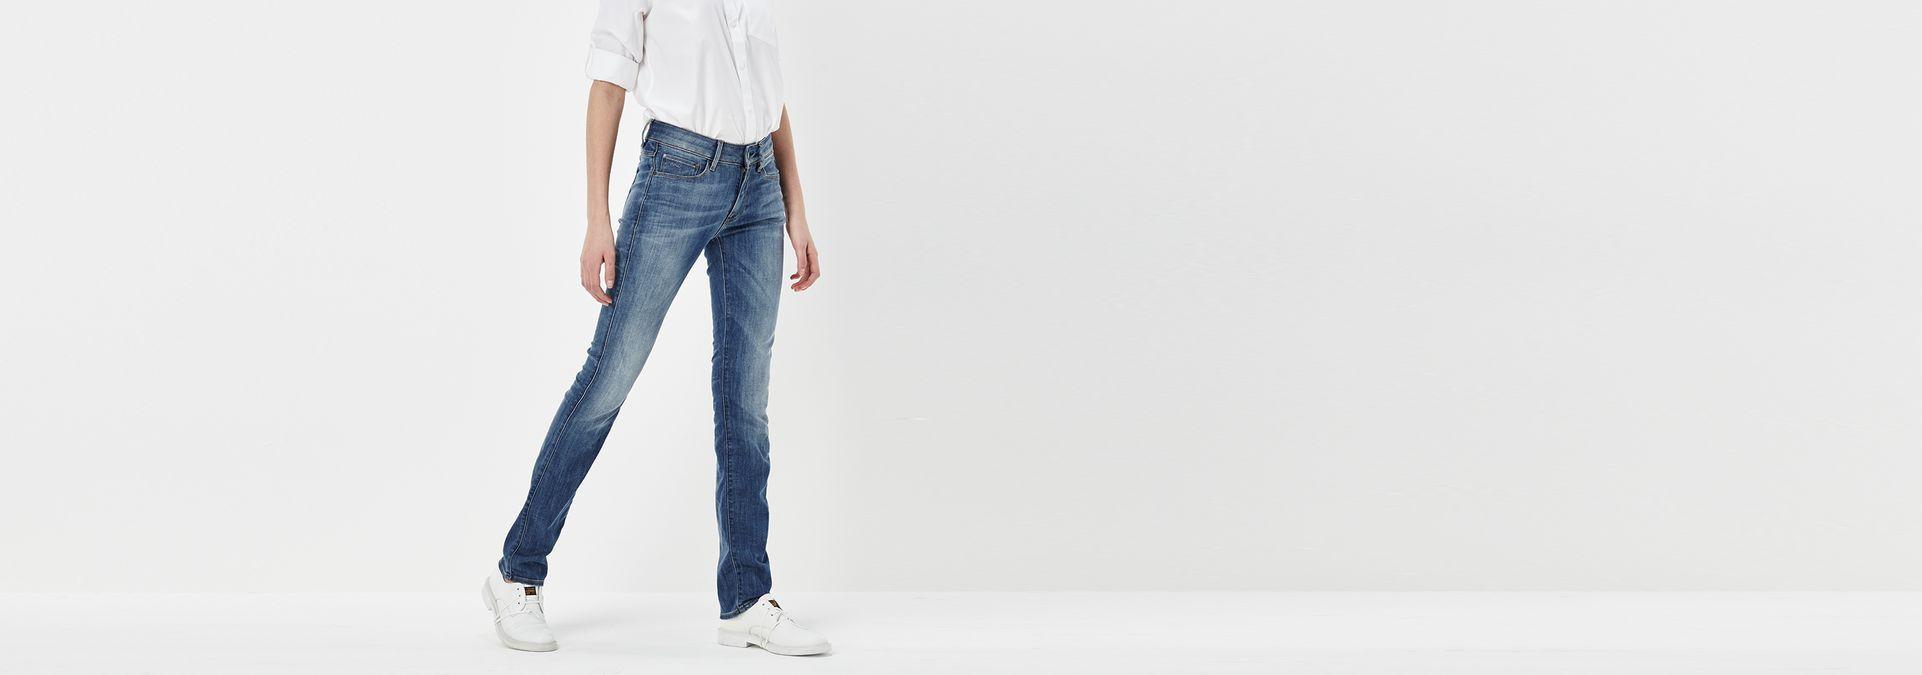 3301 contour high straight jeans medium aged g star raw. Black Bedroom Furniture Sets. Home Design Ideas